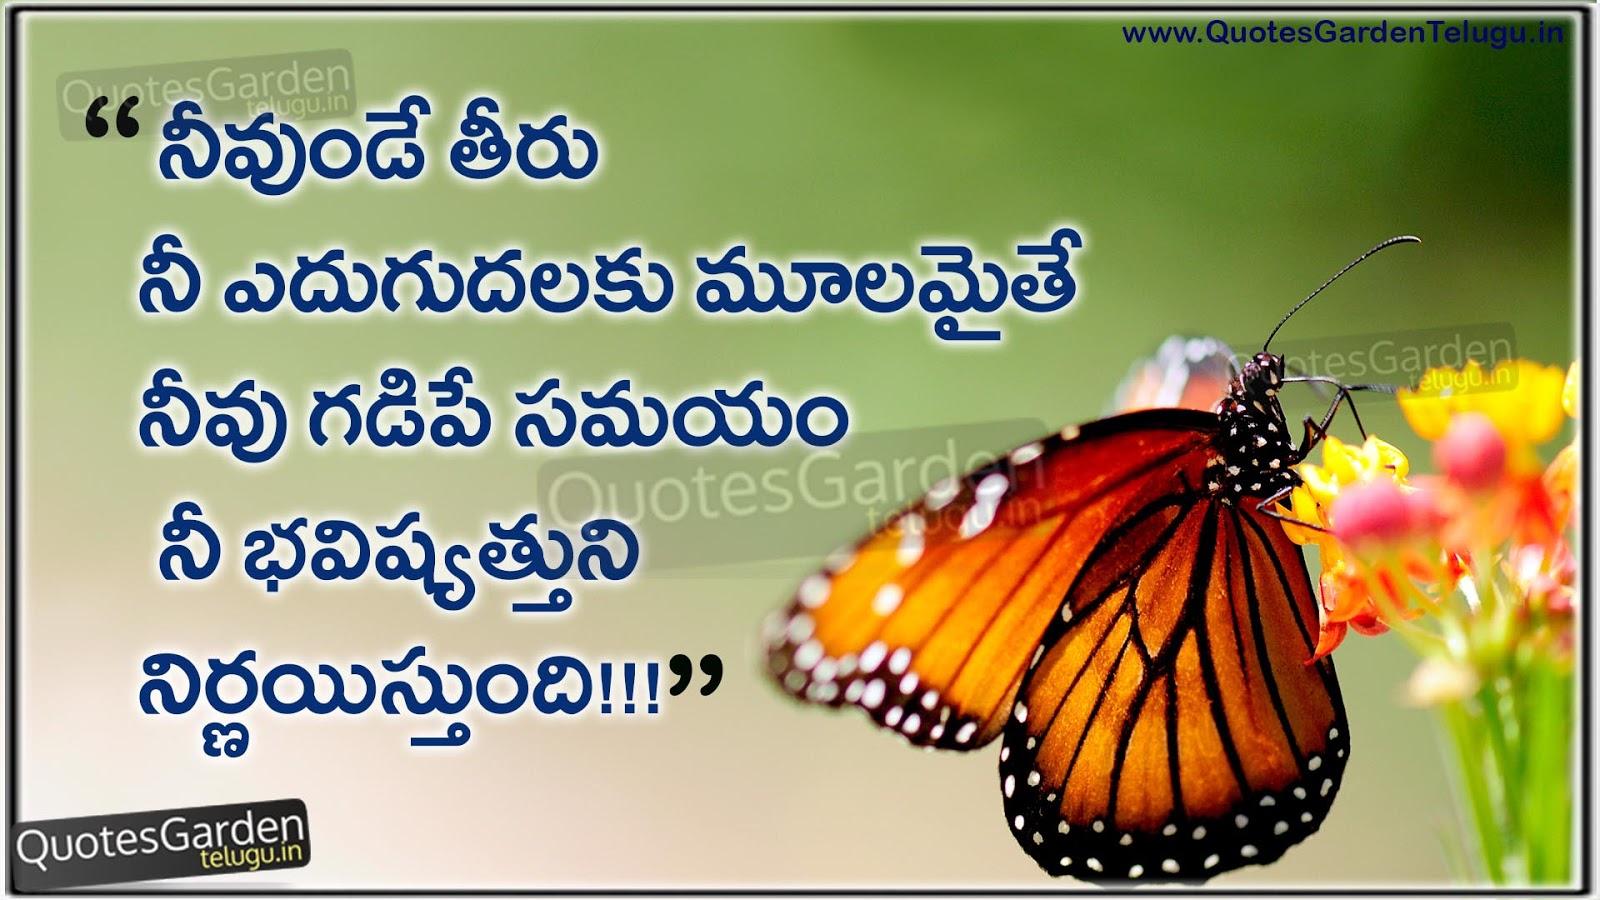 Telugu Time Value Quotations Quotes Garden Telugu Telugu Quotes English Quotes Hindi Quotes